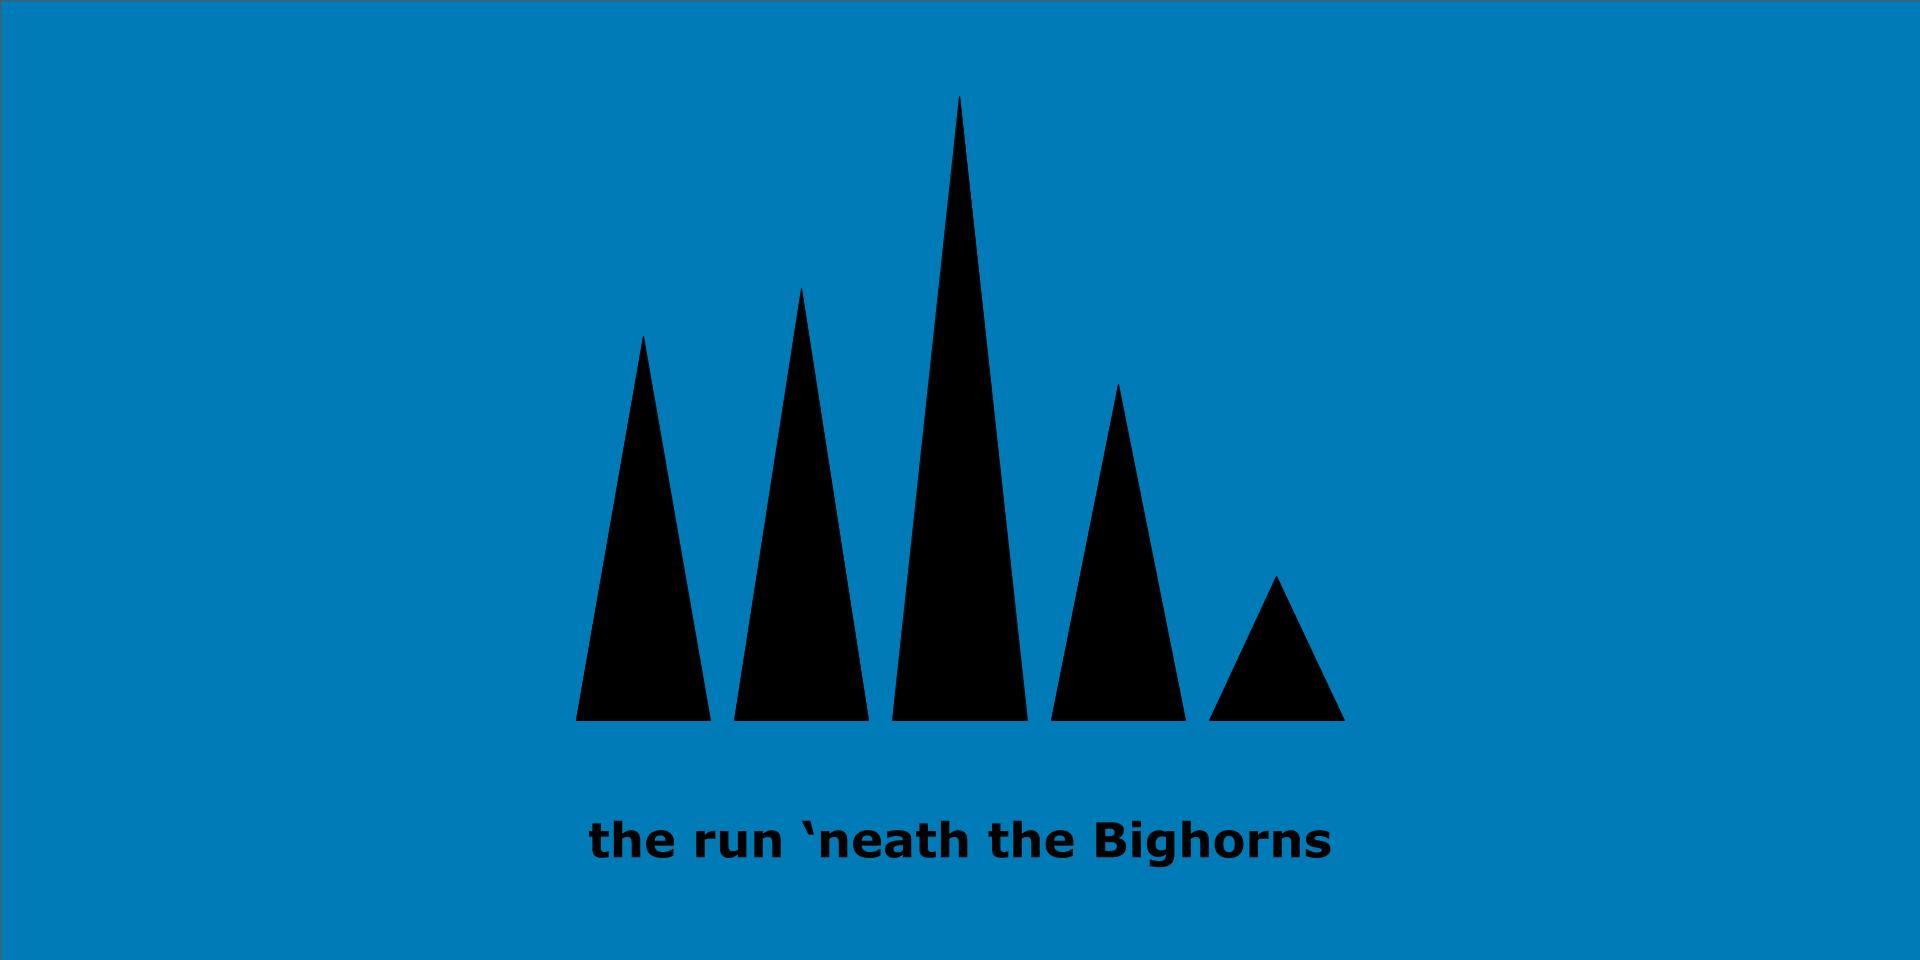 Klondike Rush - the run 'neath the Bighorns